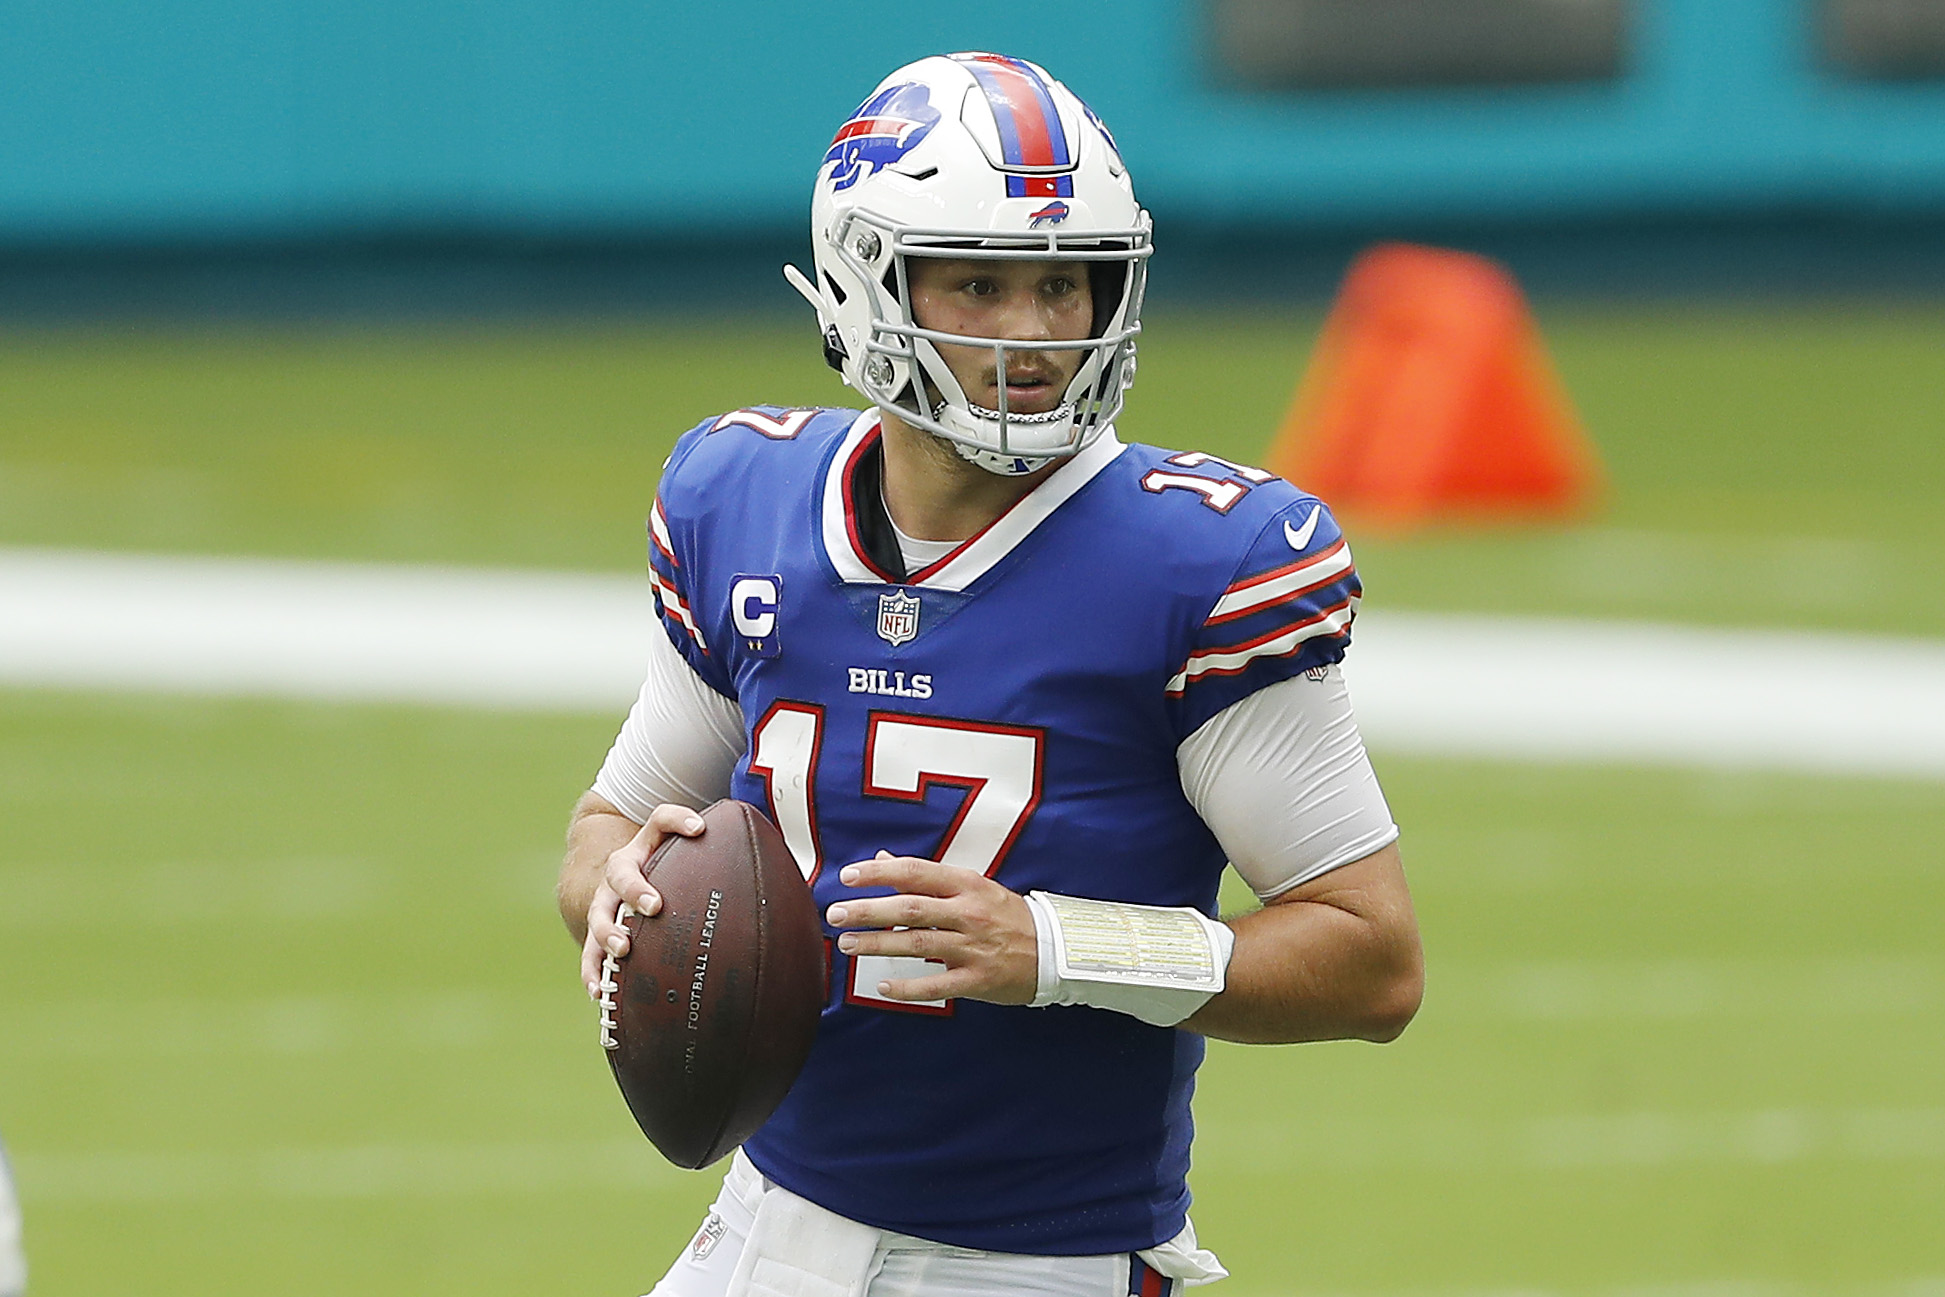 NFL: Buffalo Bills - Josh Allen